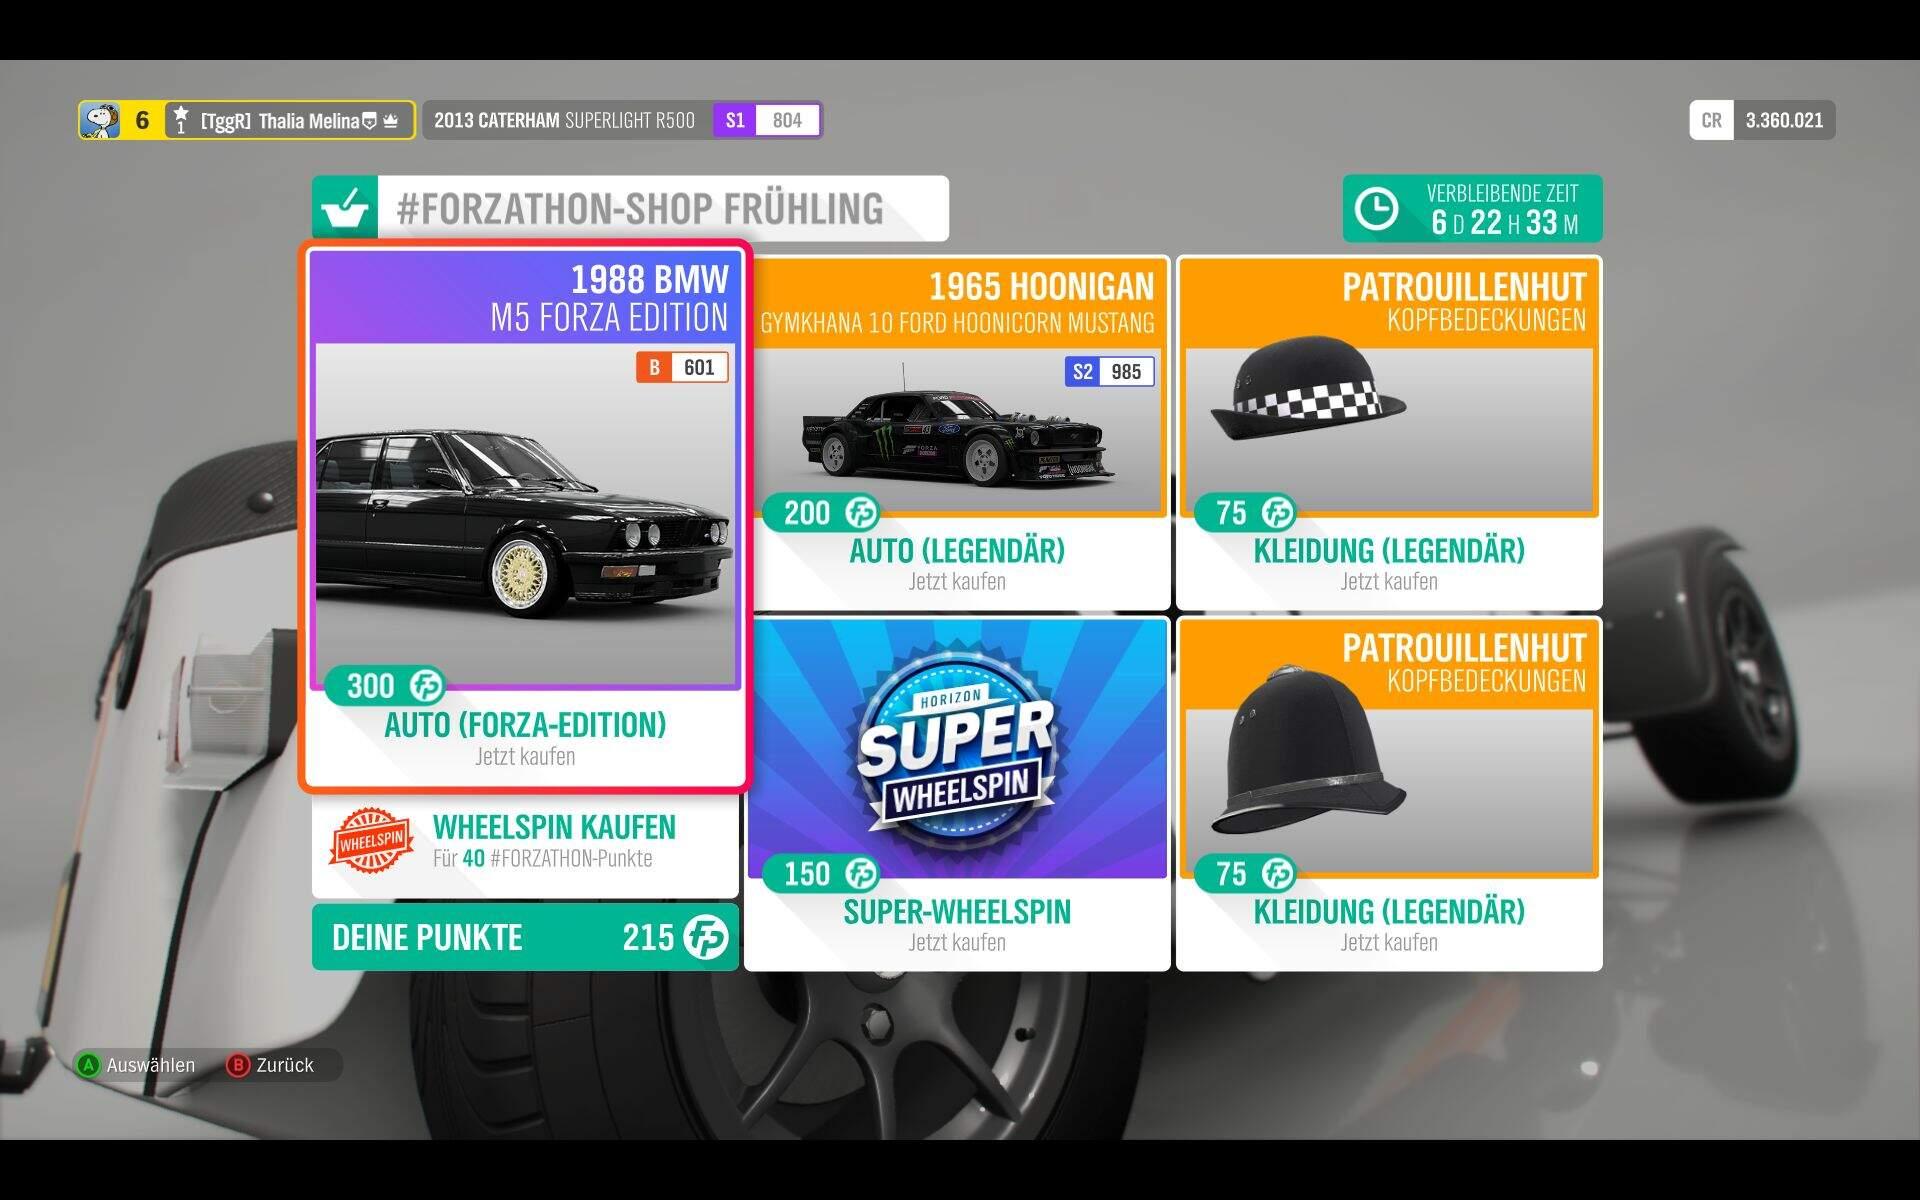 Forza Horizon 4 #Forzathon KW 46 Shop-Angebot